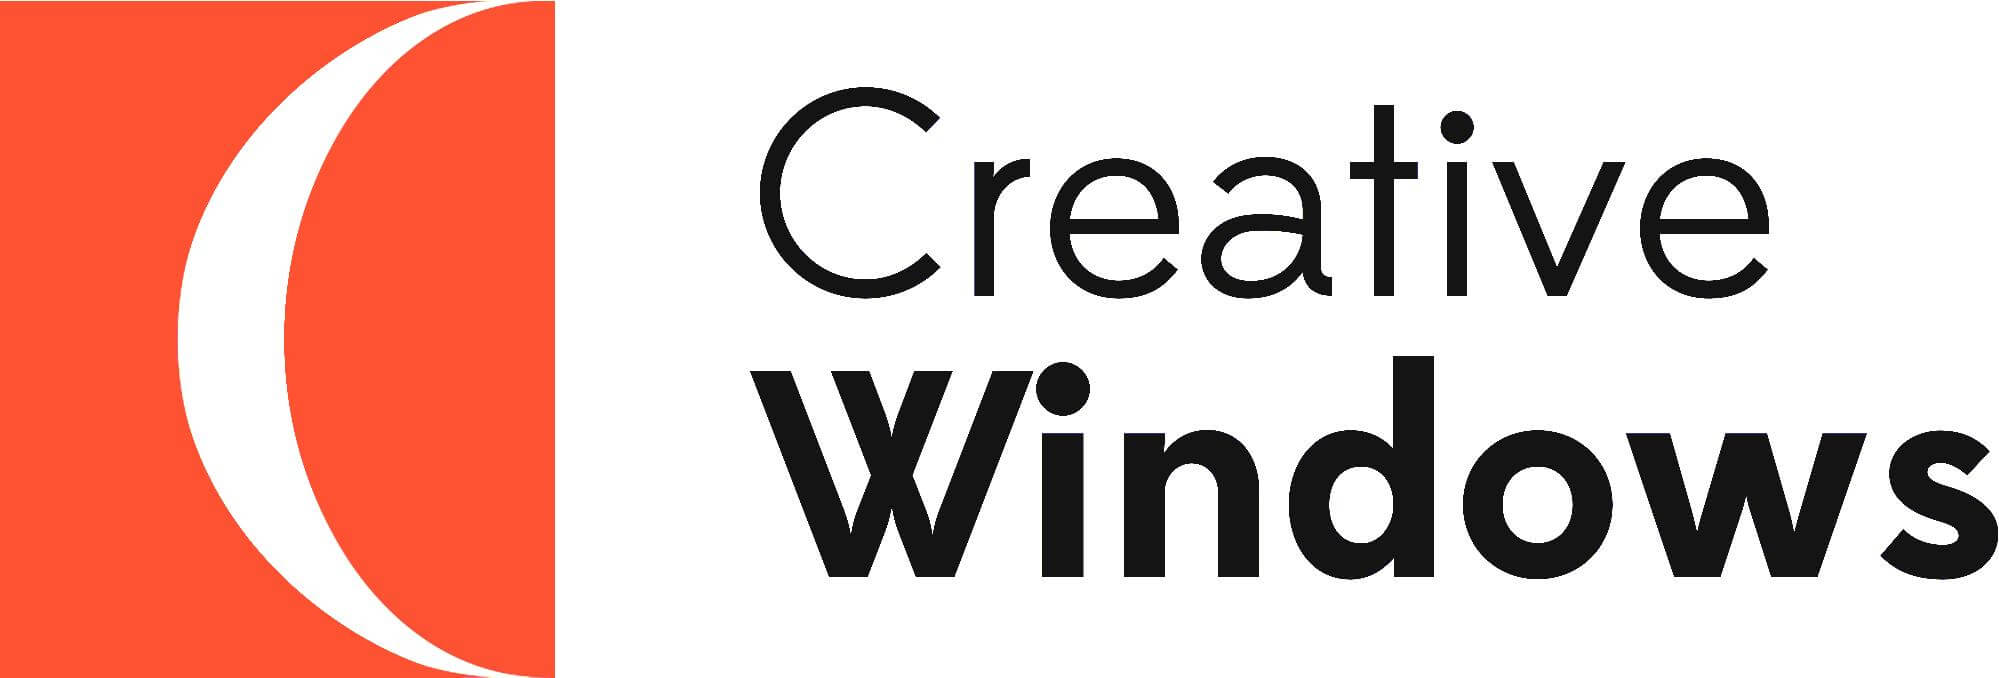 Creative Windows logo